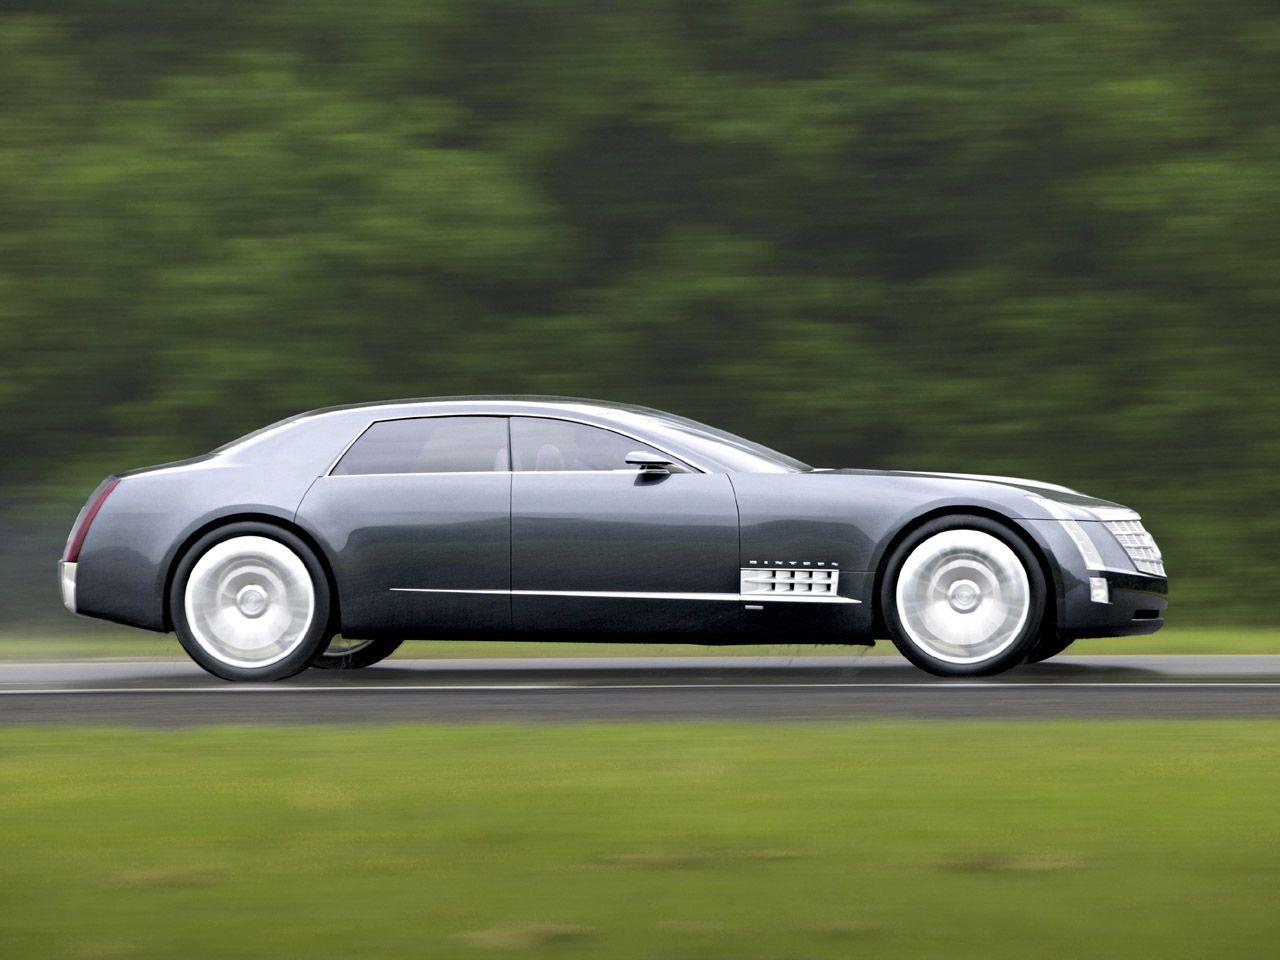 //www.seriouswheels.com/pics-abc/Cadillac-Sixteen-Concept-Side ...